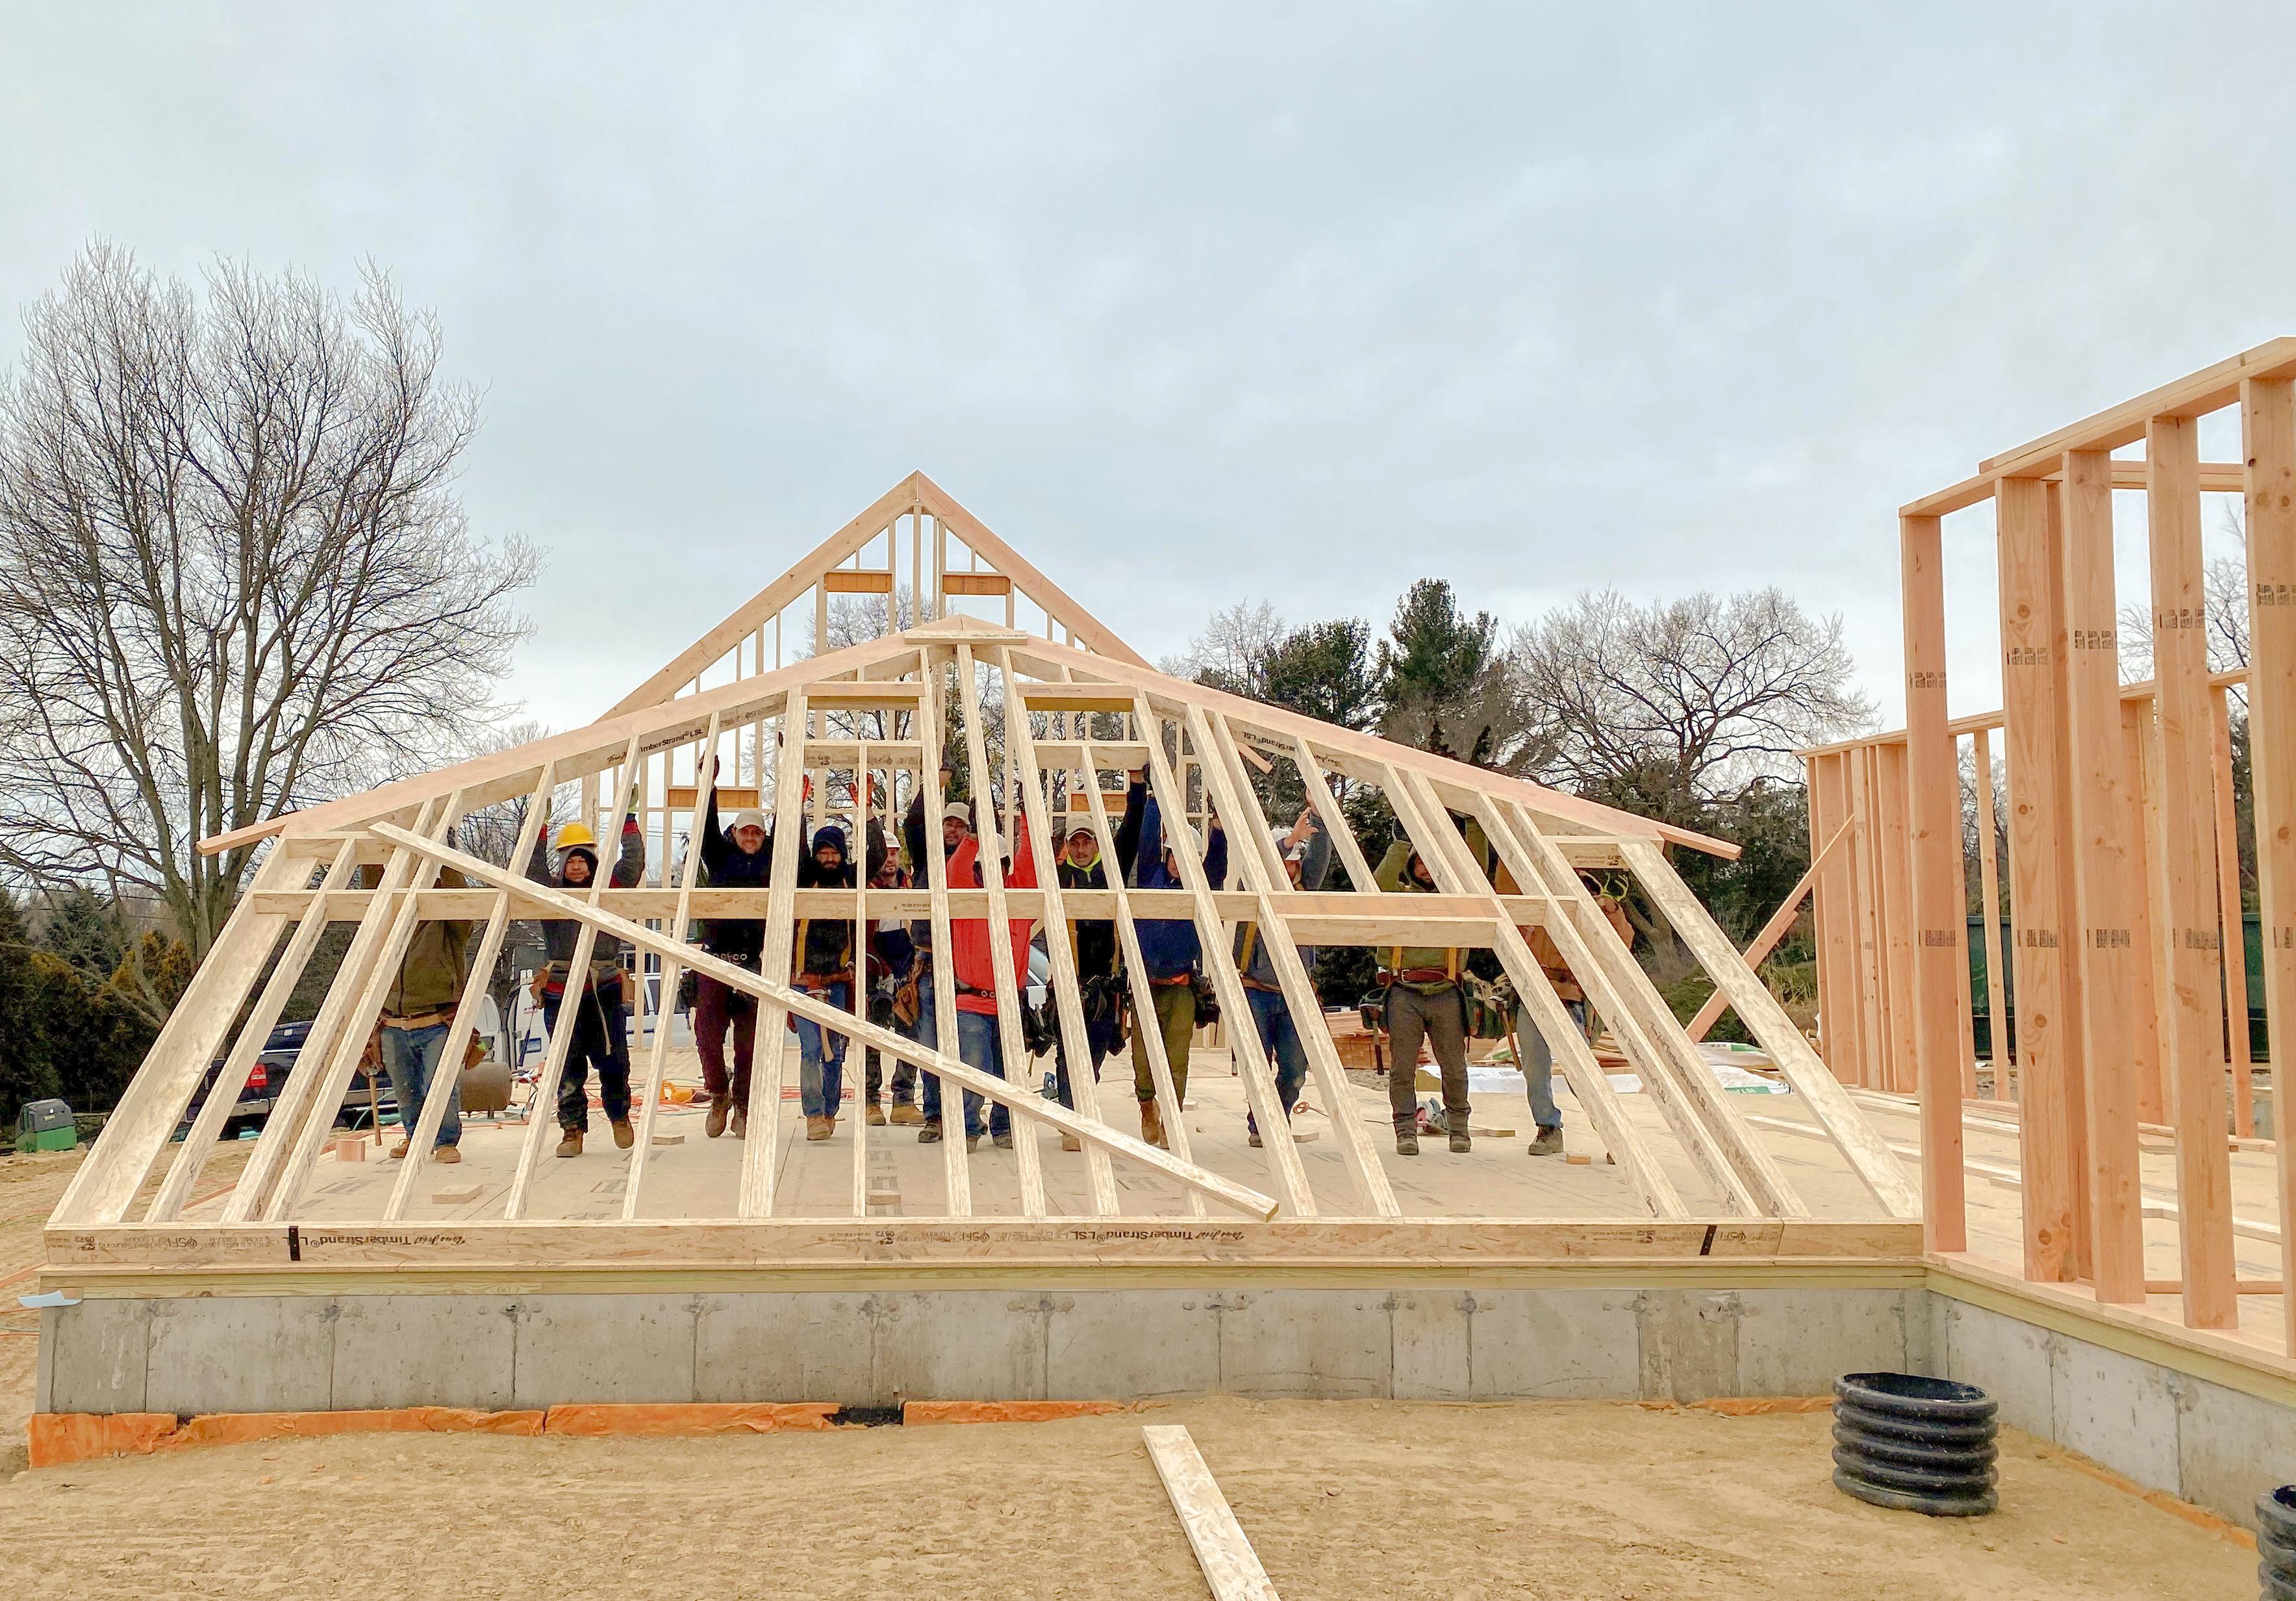 Fairfield County Farmhouse, Progress, Raising Walls